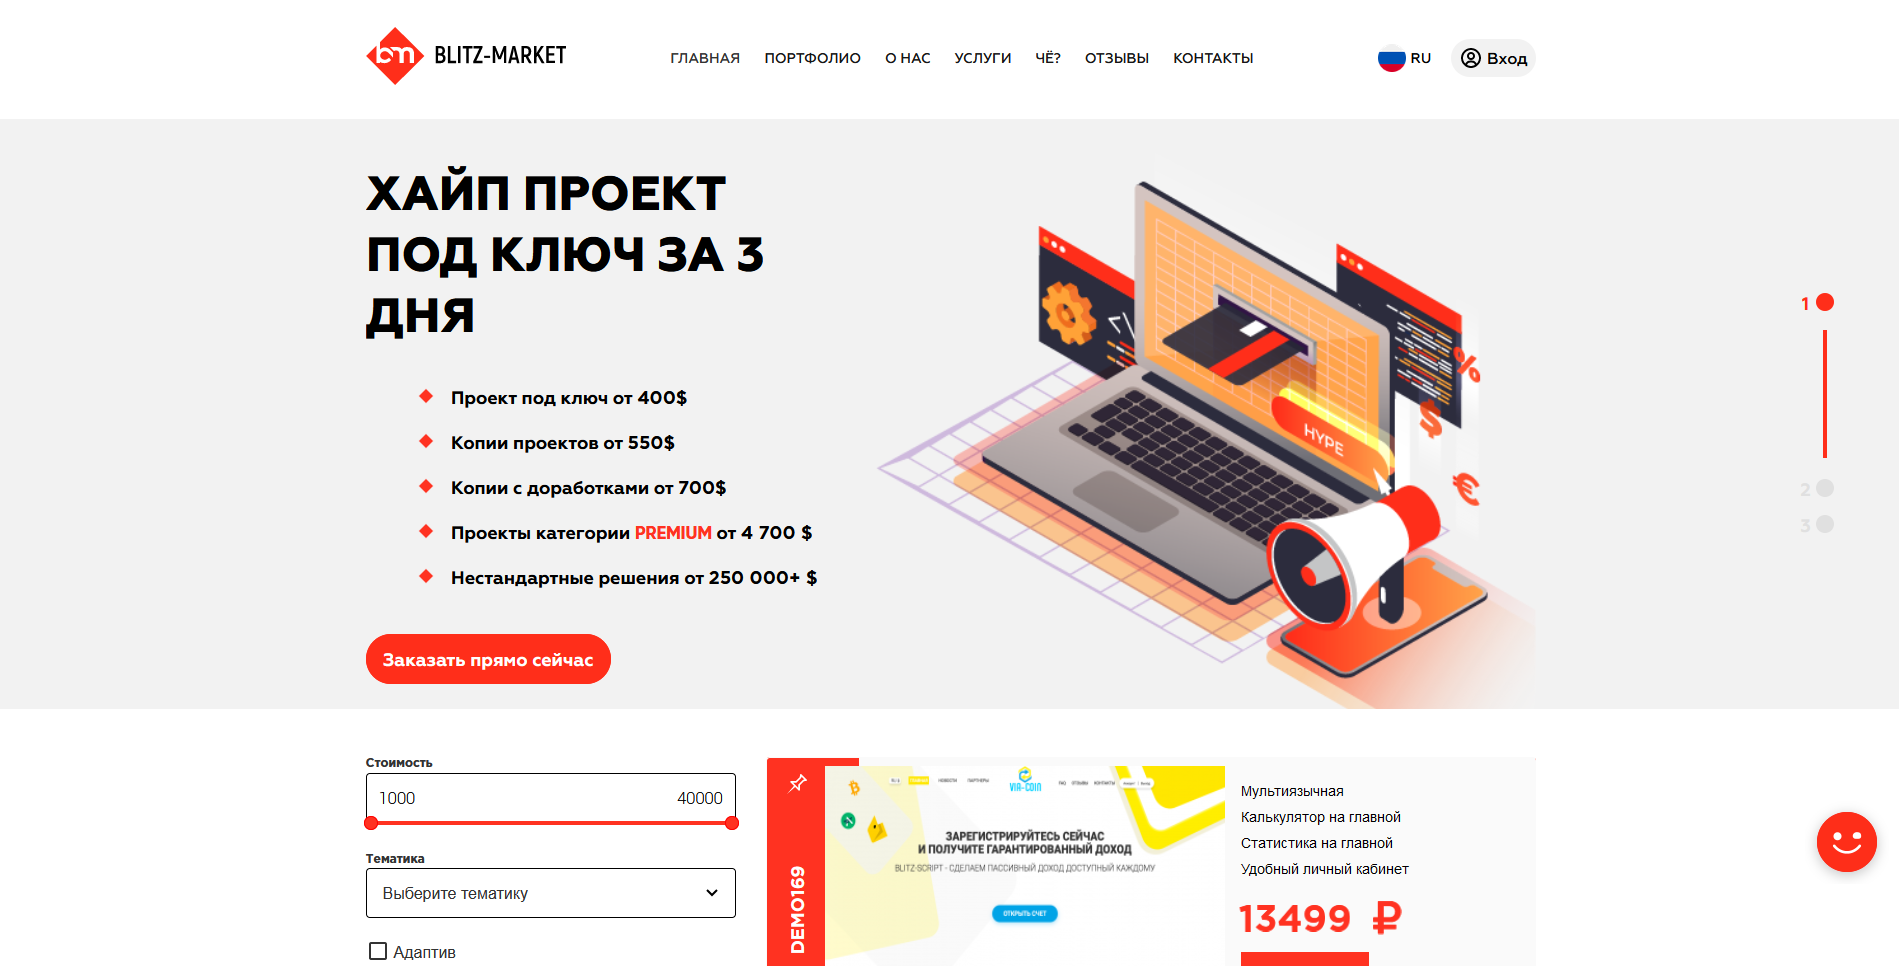 Blitz-Market.ru – купить хайп